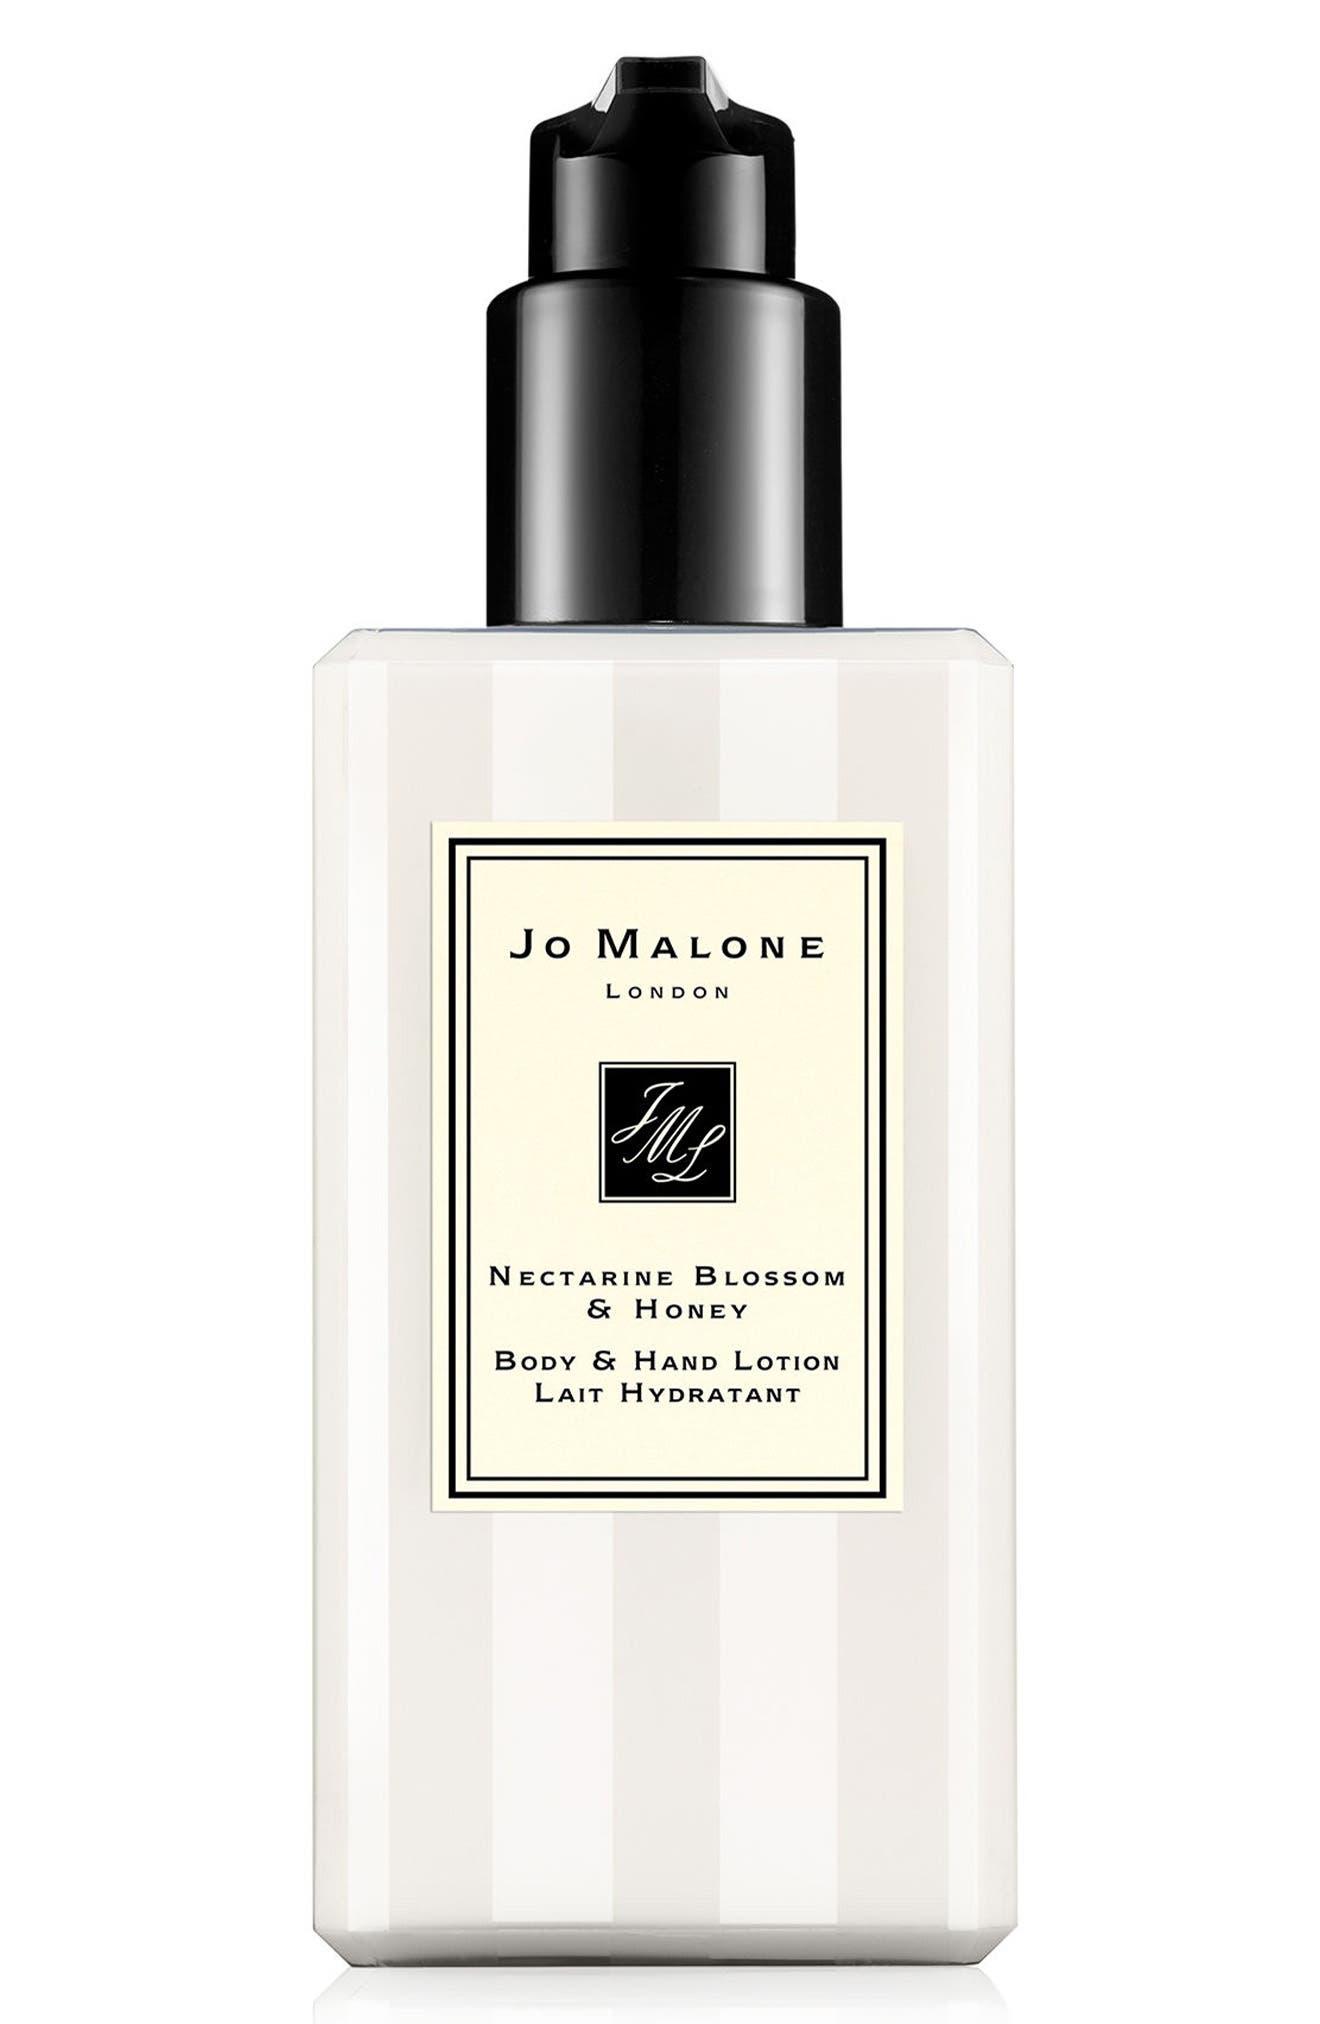 Alternate Image 1 Selected - Jo Malone London™ 'Nectarine Blossom & Honey' Body & Hand Lotion